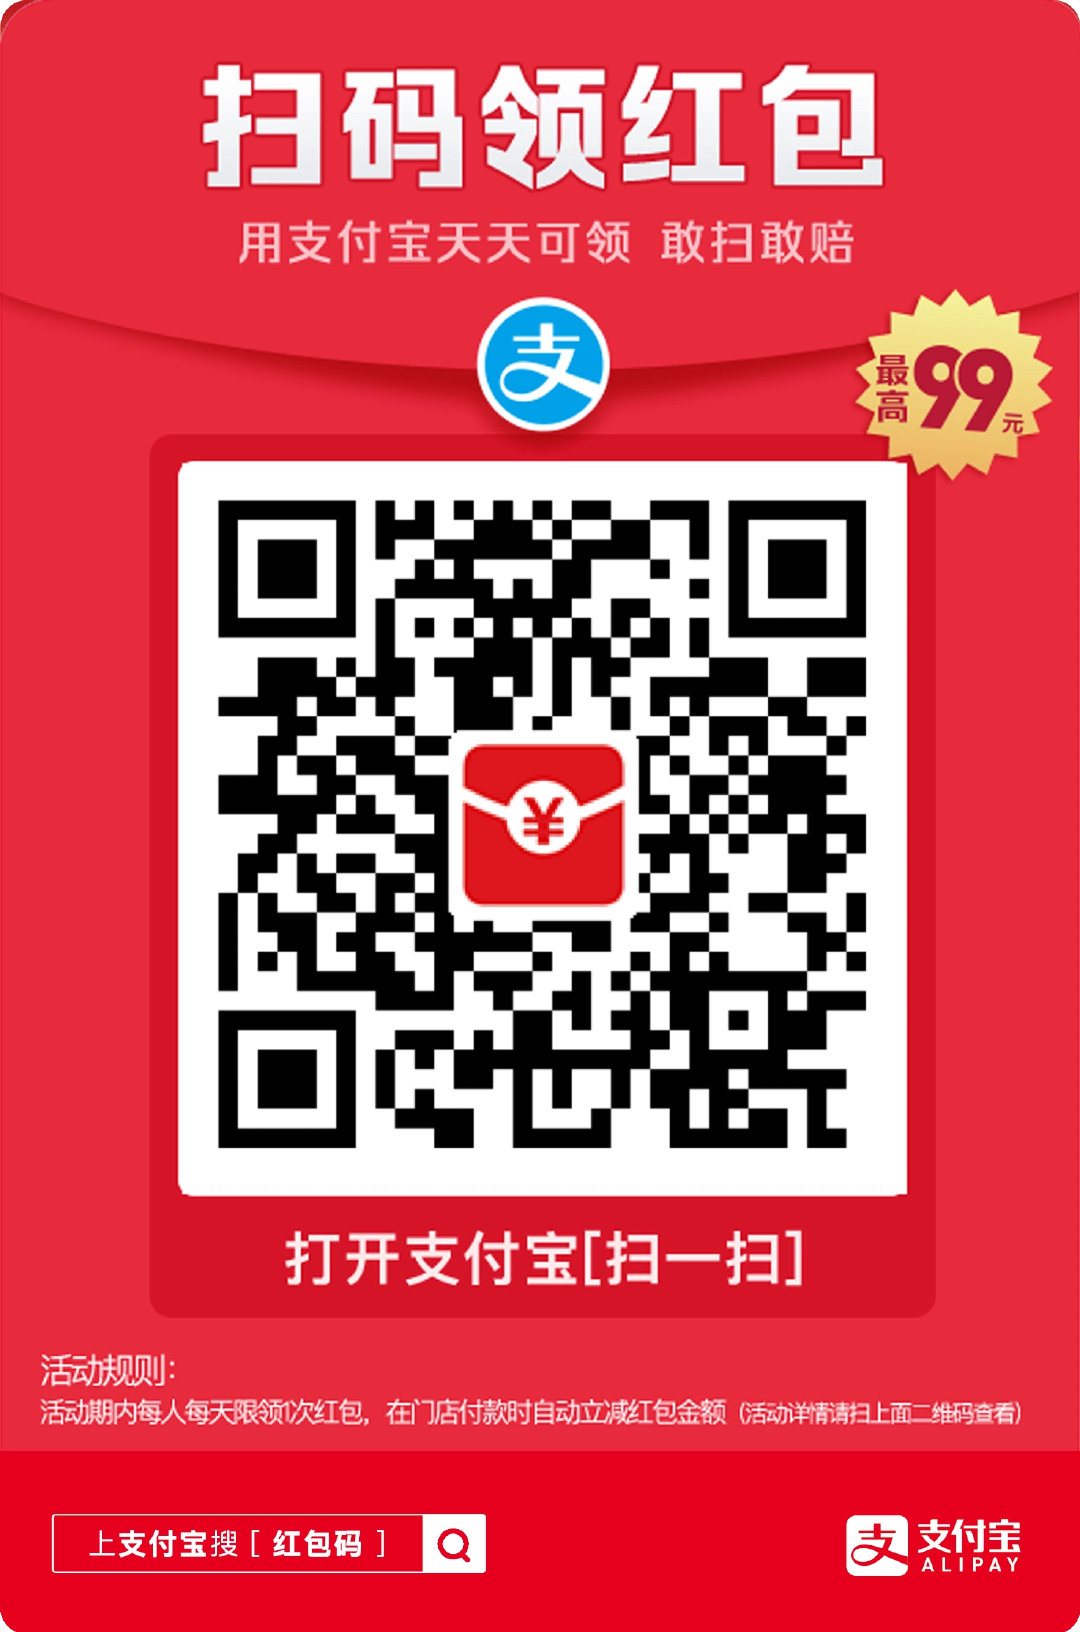 cn_nur.cn微软版下载_28app